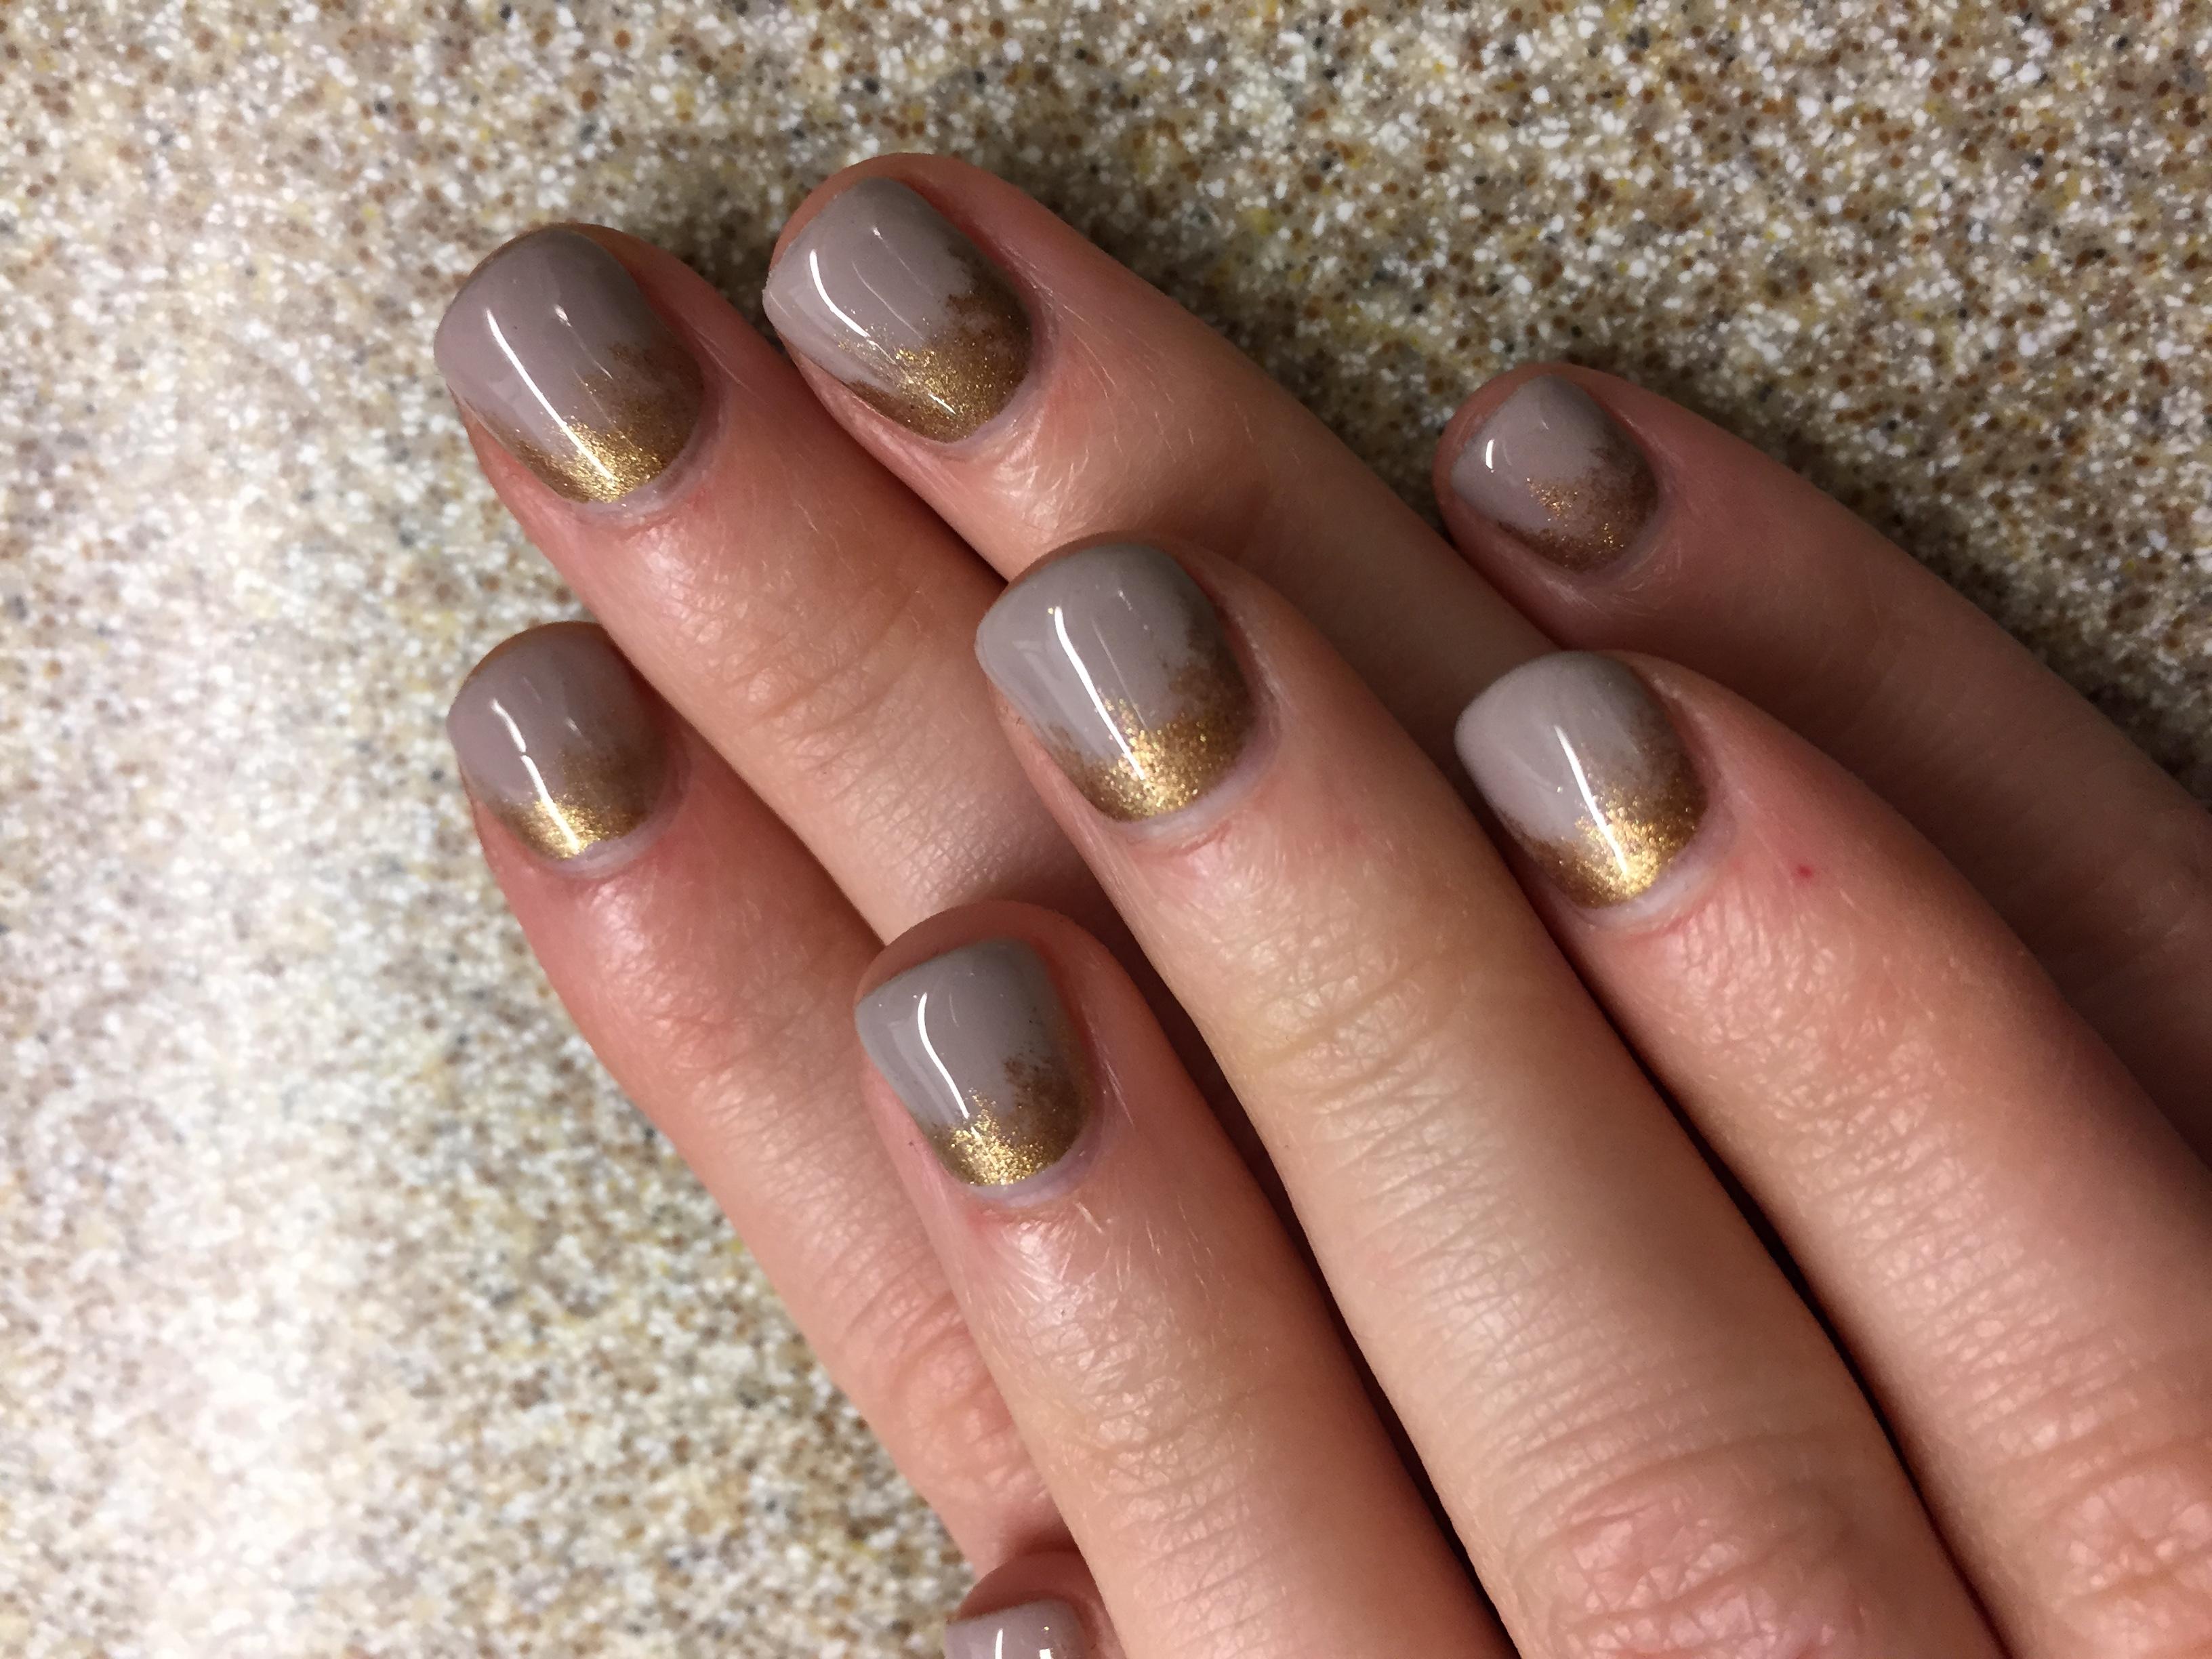 Guest Nails | Dosha Salon Spa - Portland\'s premier Aveda Salon Spa